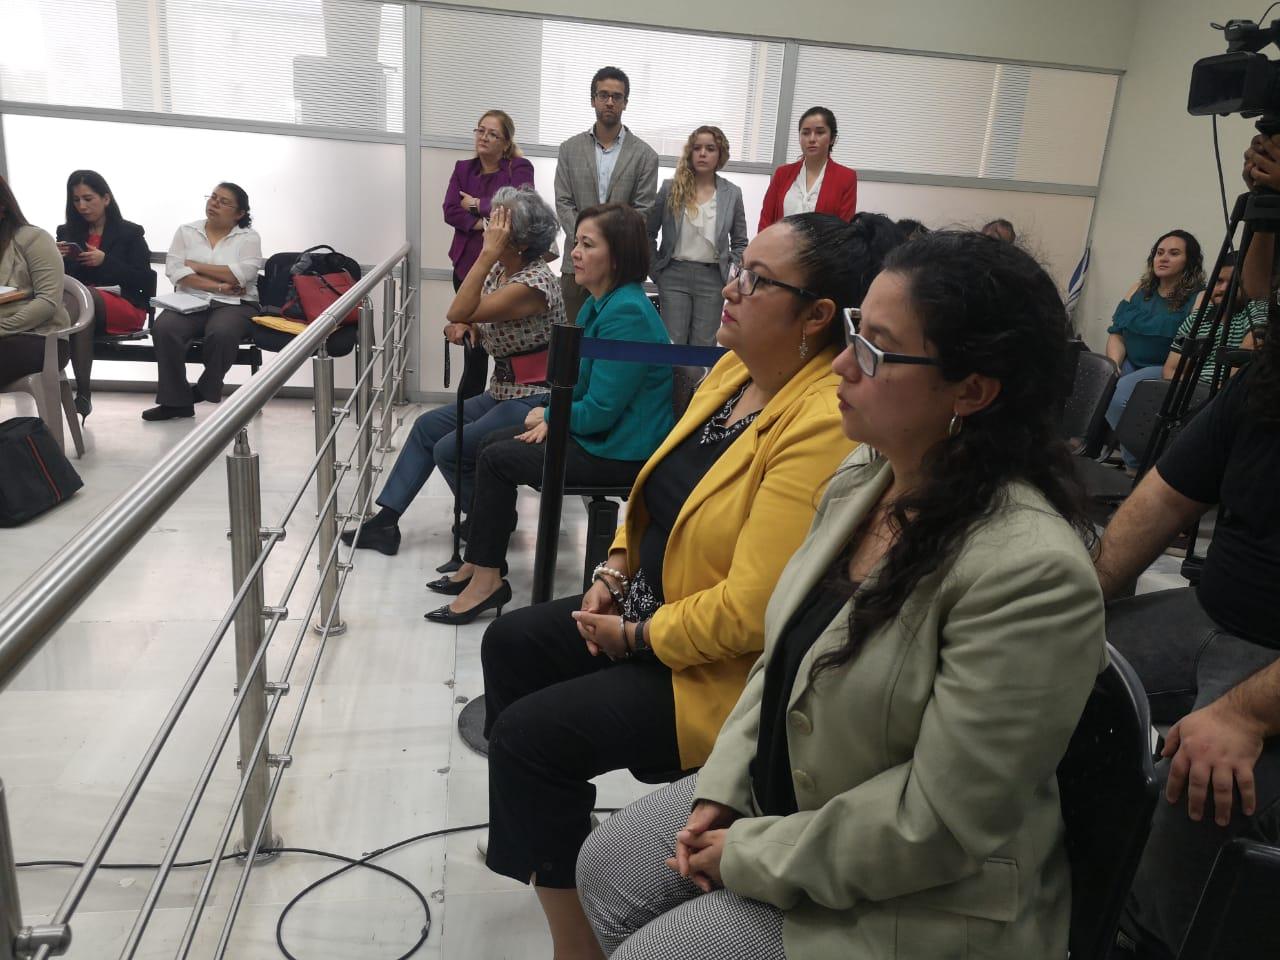 Juez liga a proceso a tres por caso edificio del MP